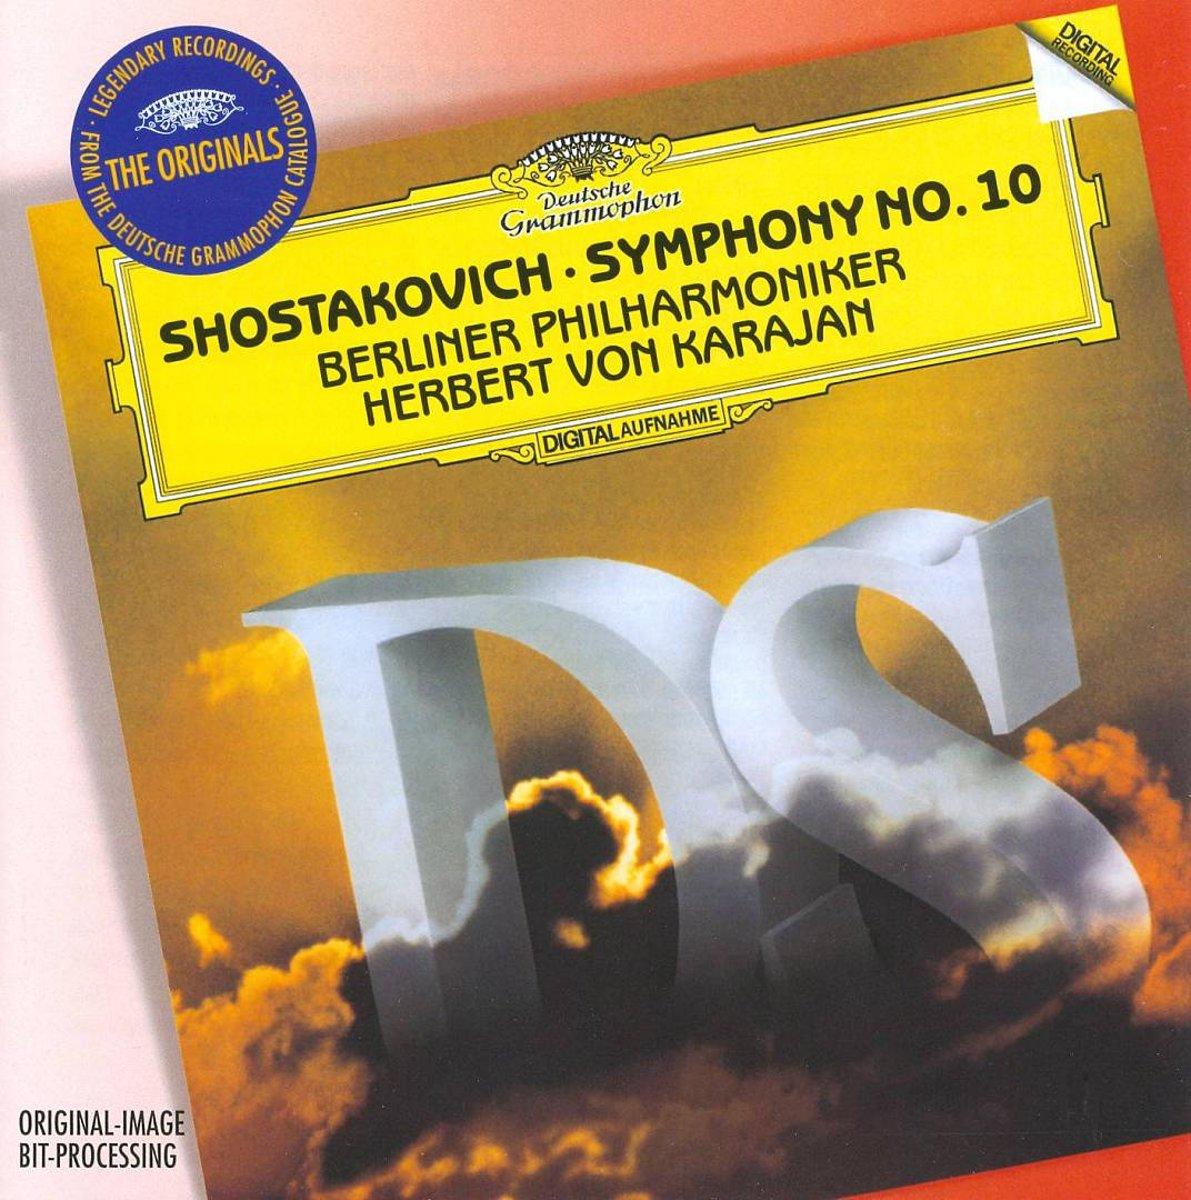 Herbert von Karajan. Shostakovich: Symphony No.10 herbert von karajan beethoven symphony no 9 overture